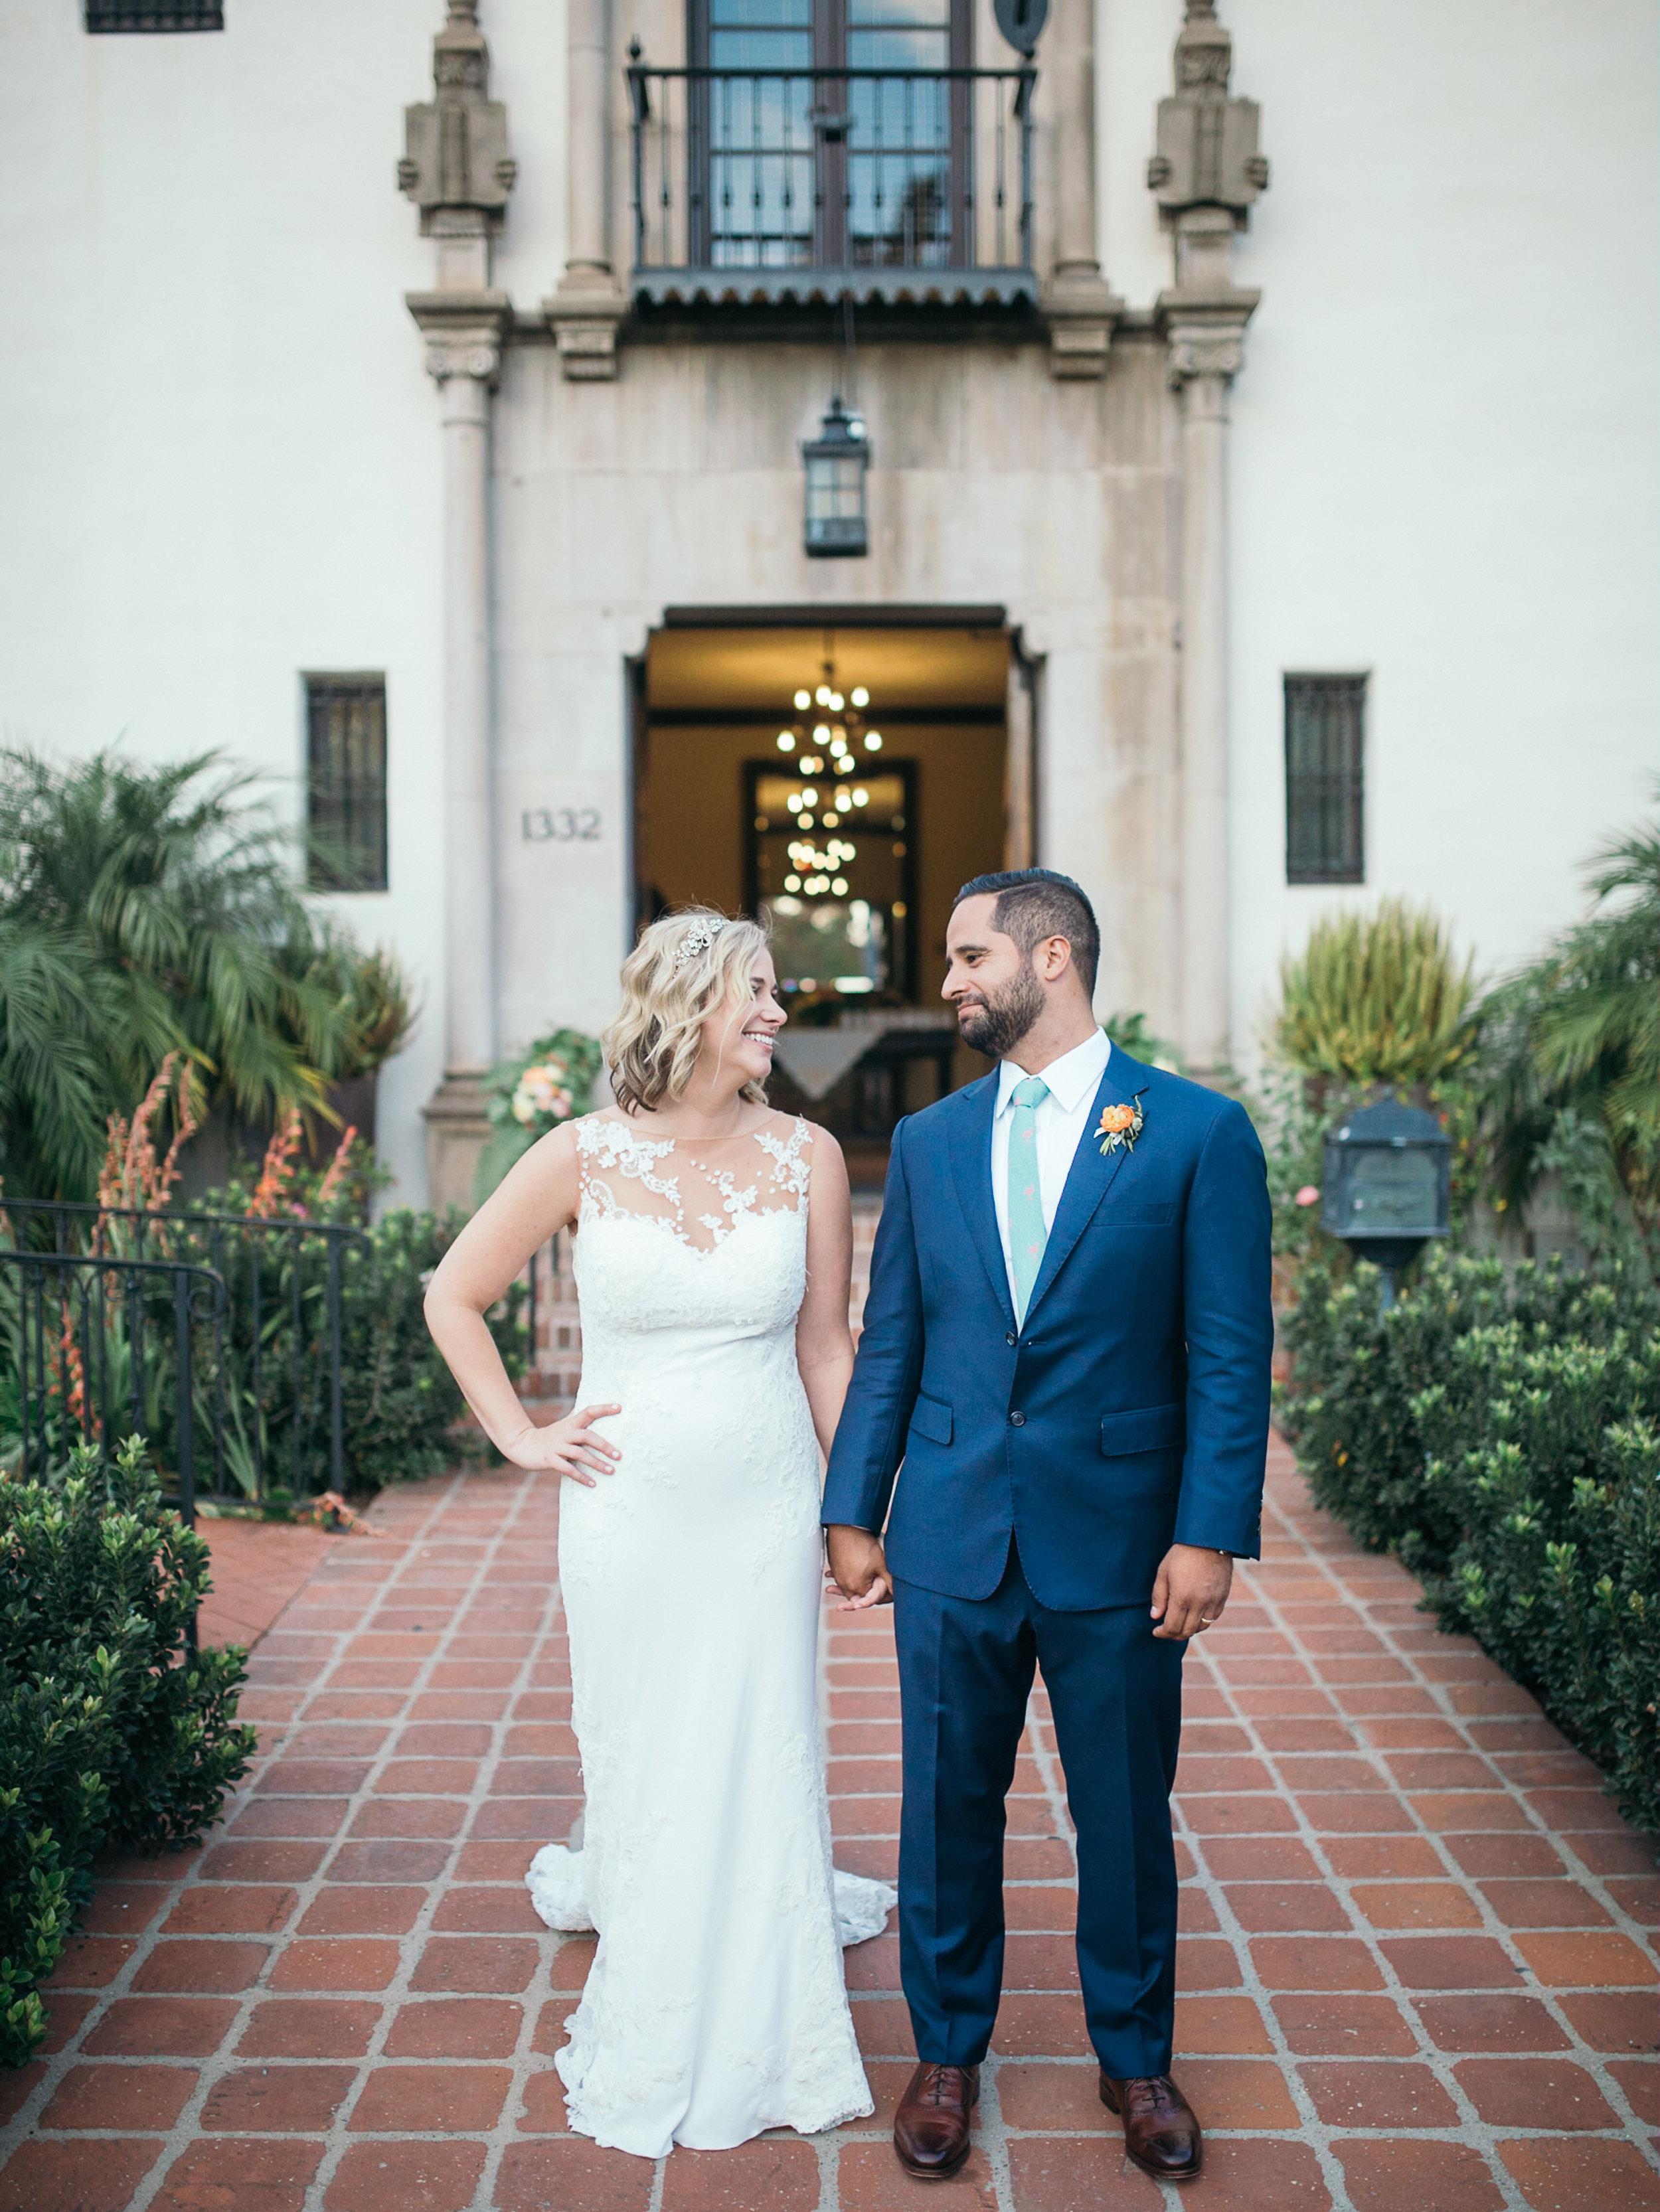 www.santabarbarawedding.com | Kiel Rucker | Riviera Mansion | Bride and Groom